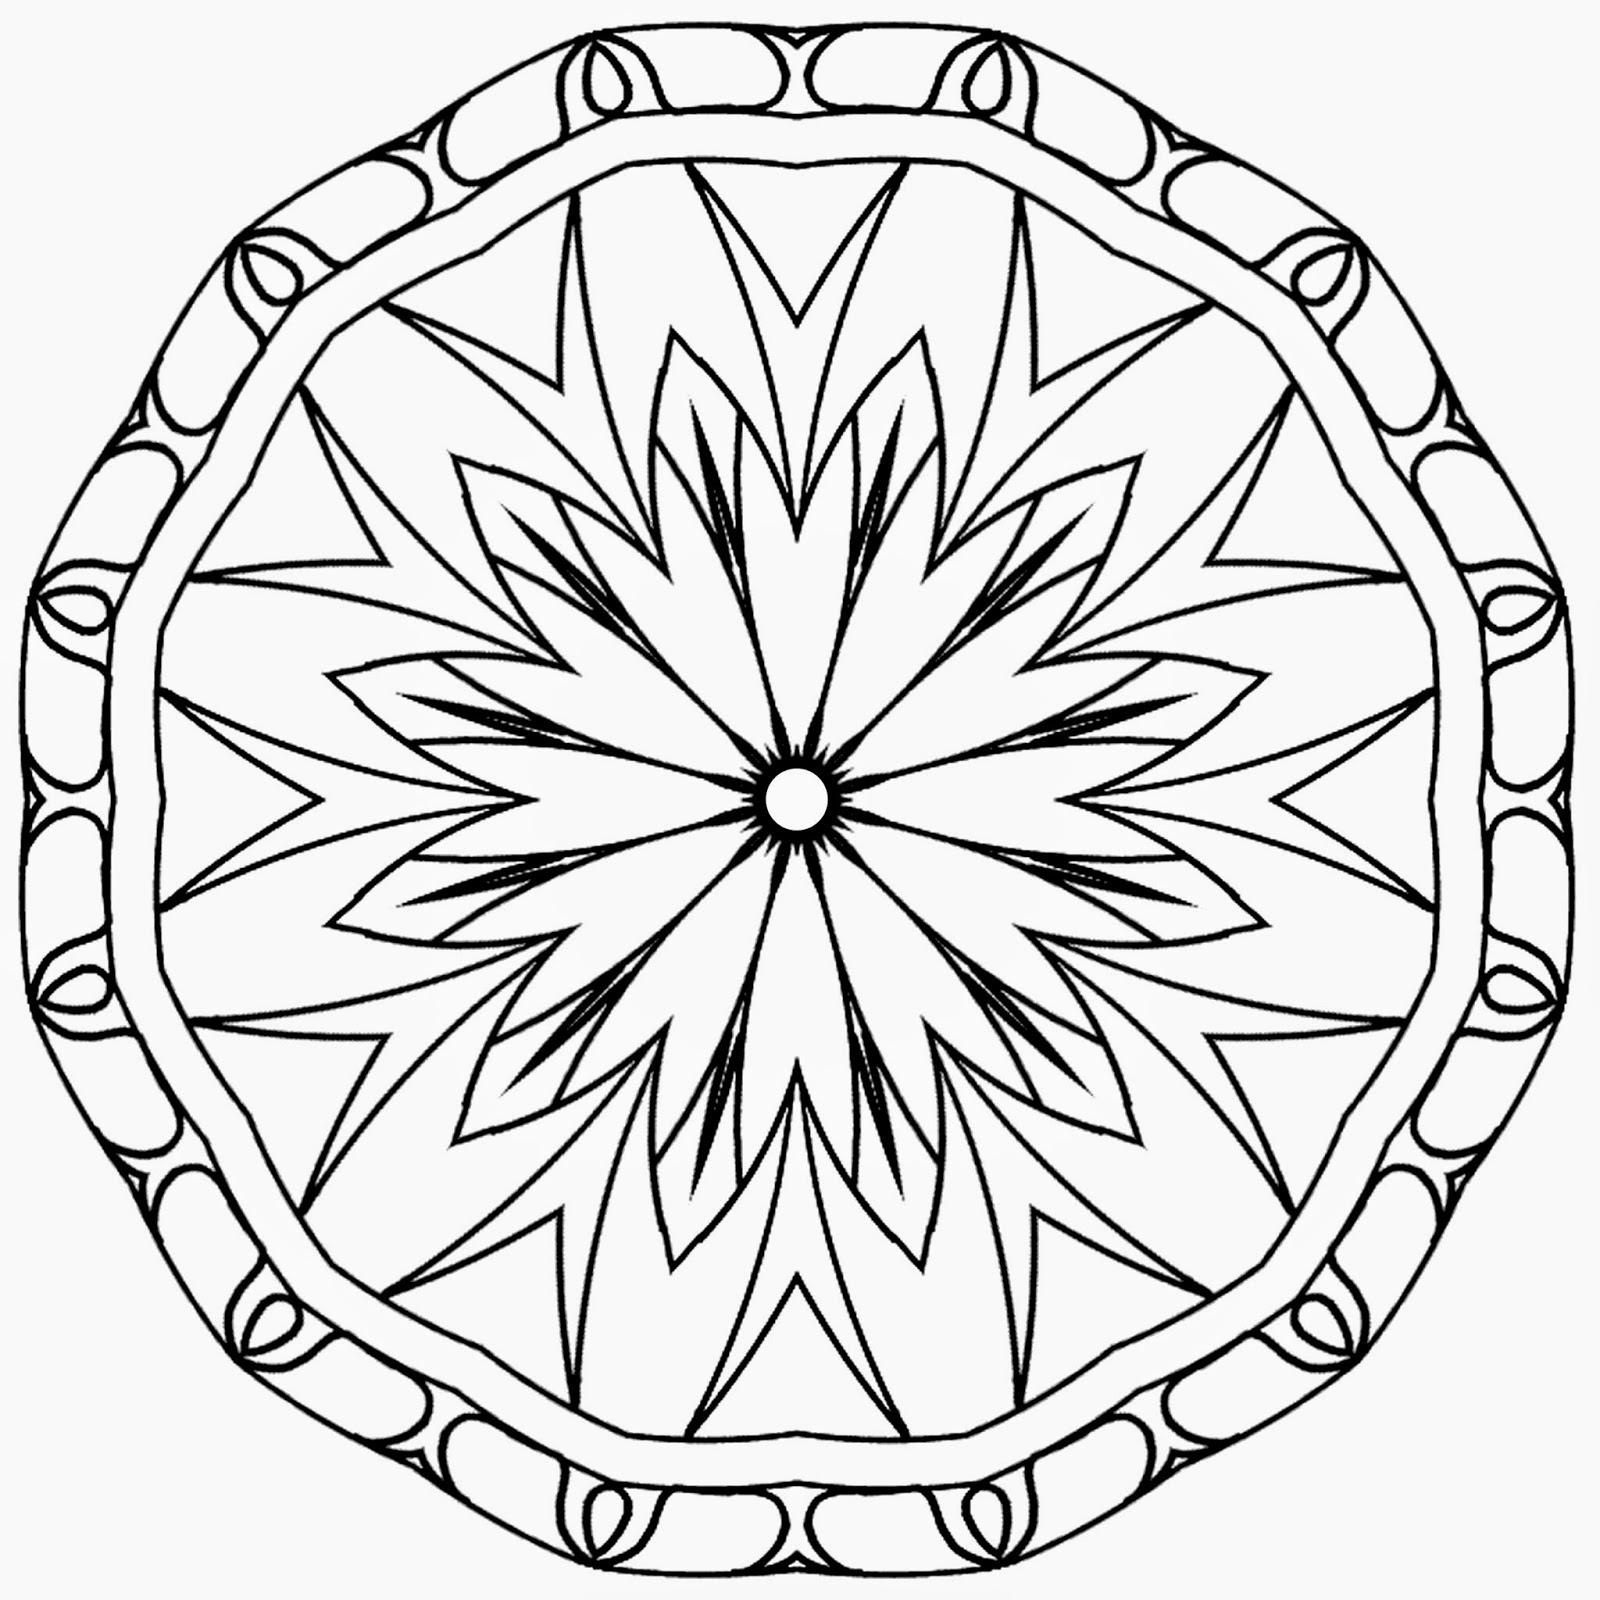 Ni os coloreando mandalas laura podio for Mandalas ninos